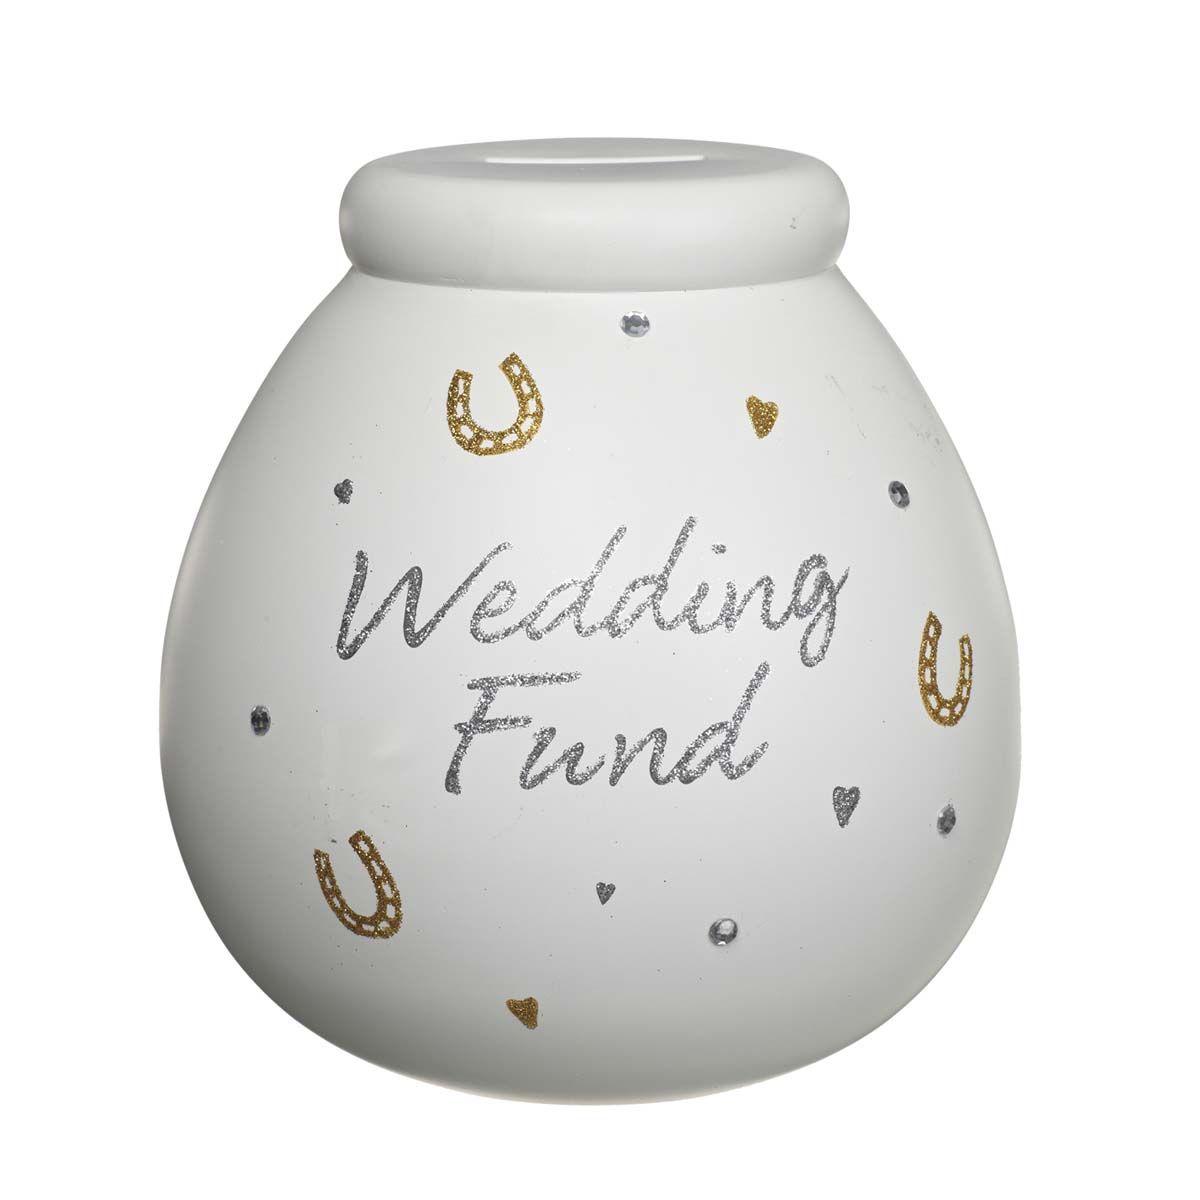 Honeymoon Fund Pots of Dreams Money Pot Save Up /& Smash Money Box Gift